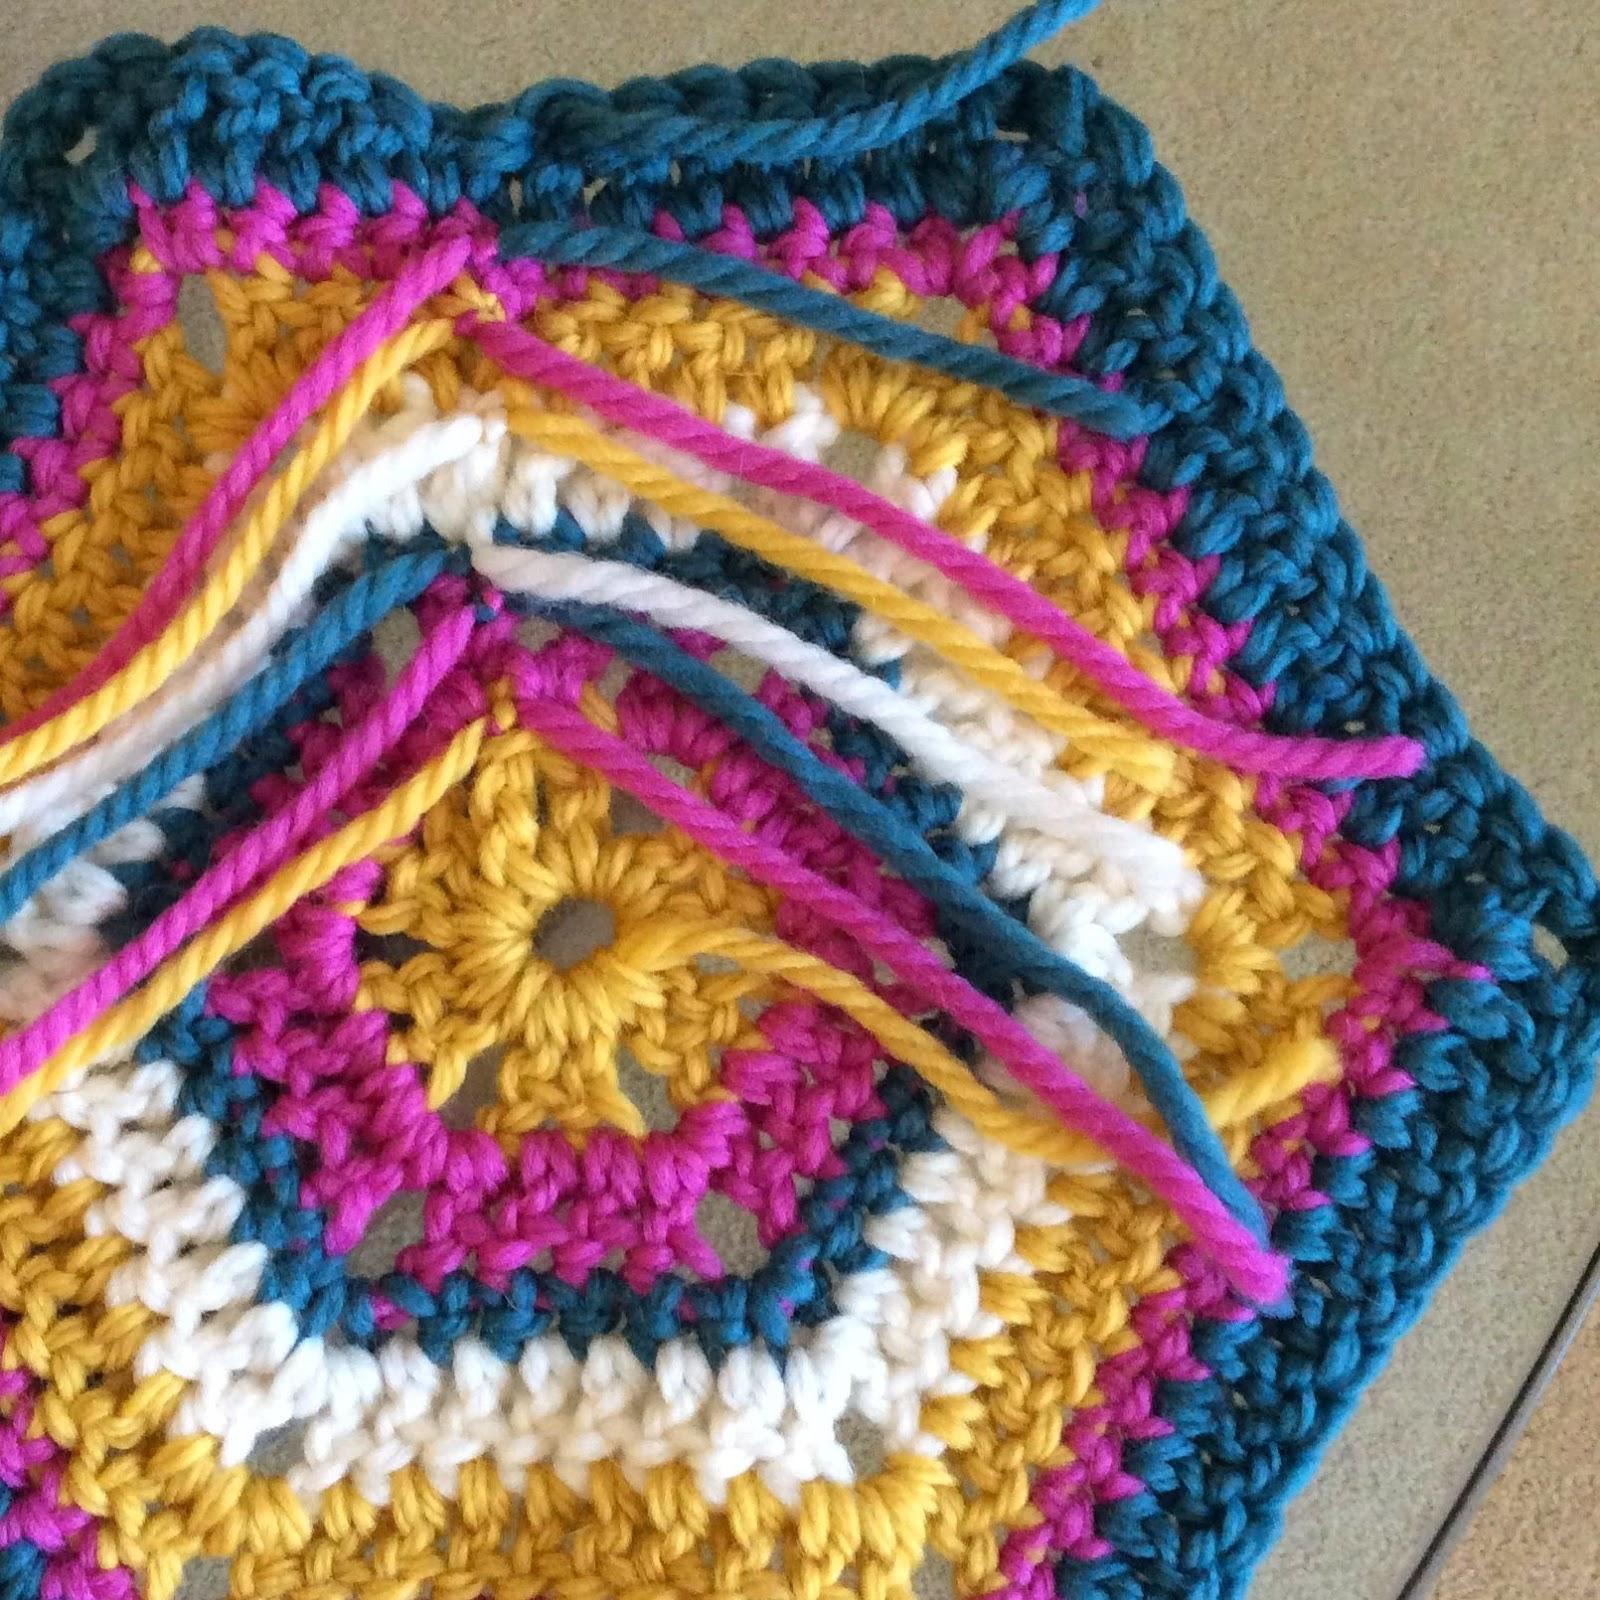 Understanding Crocheting : Understanding Crochet with the Rowan Spring Crochet Along! Life ...